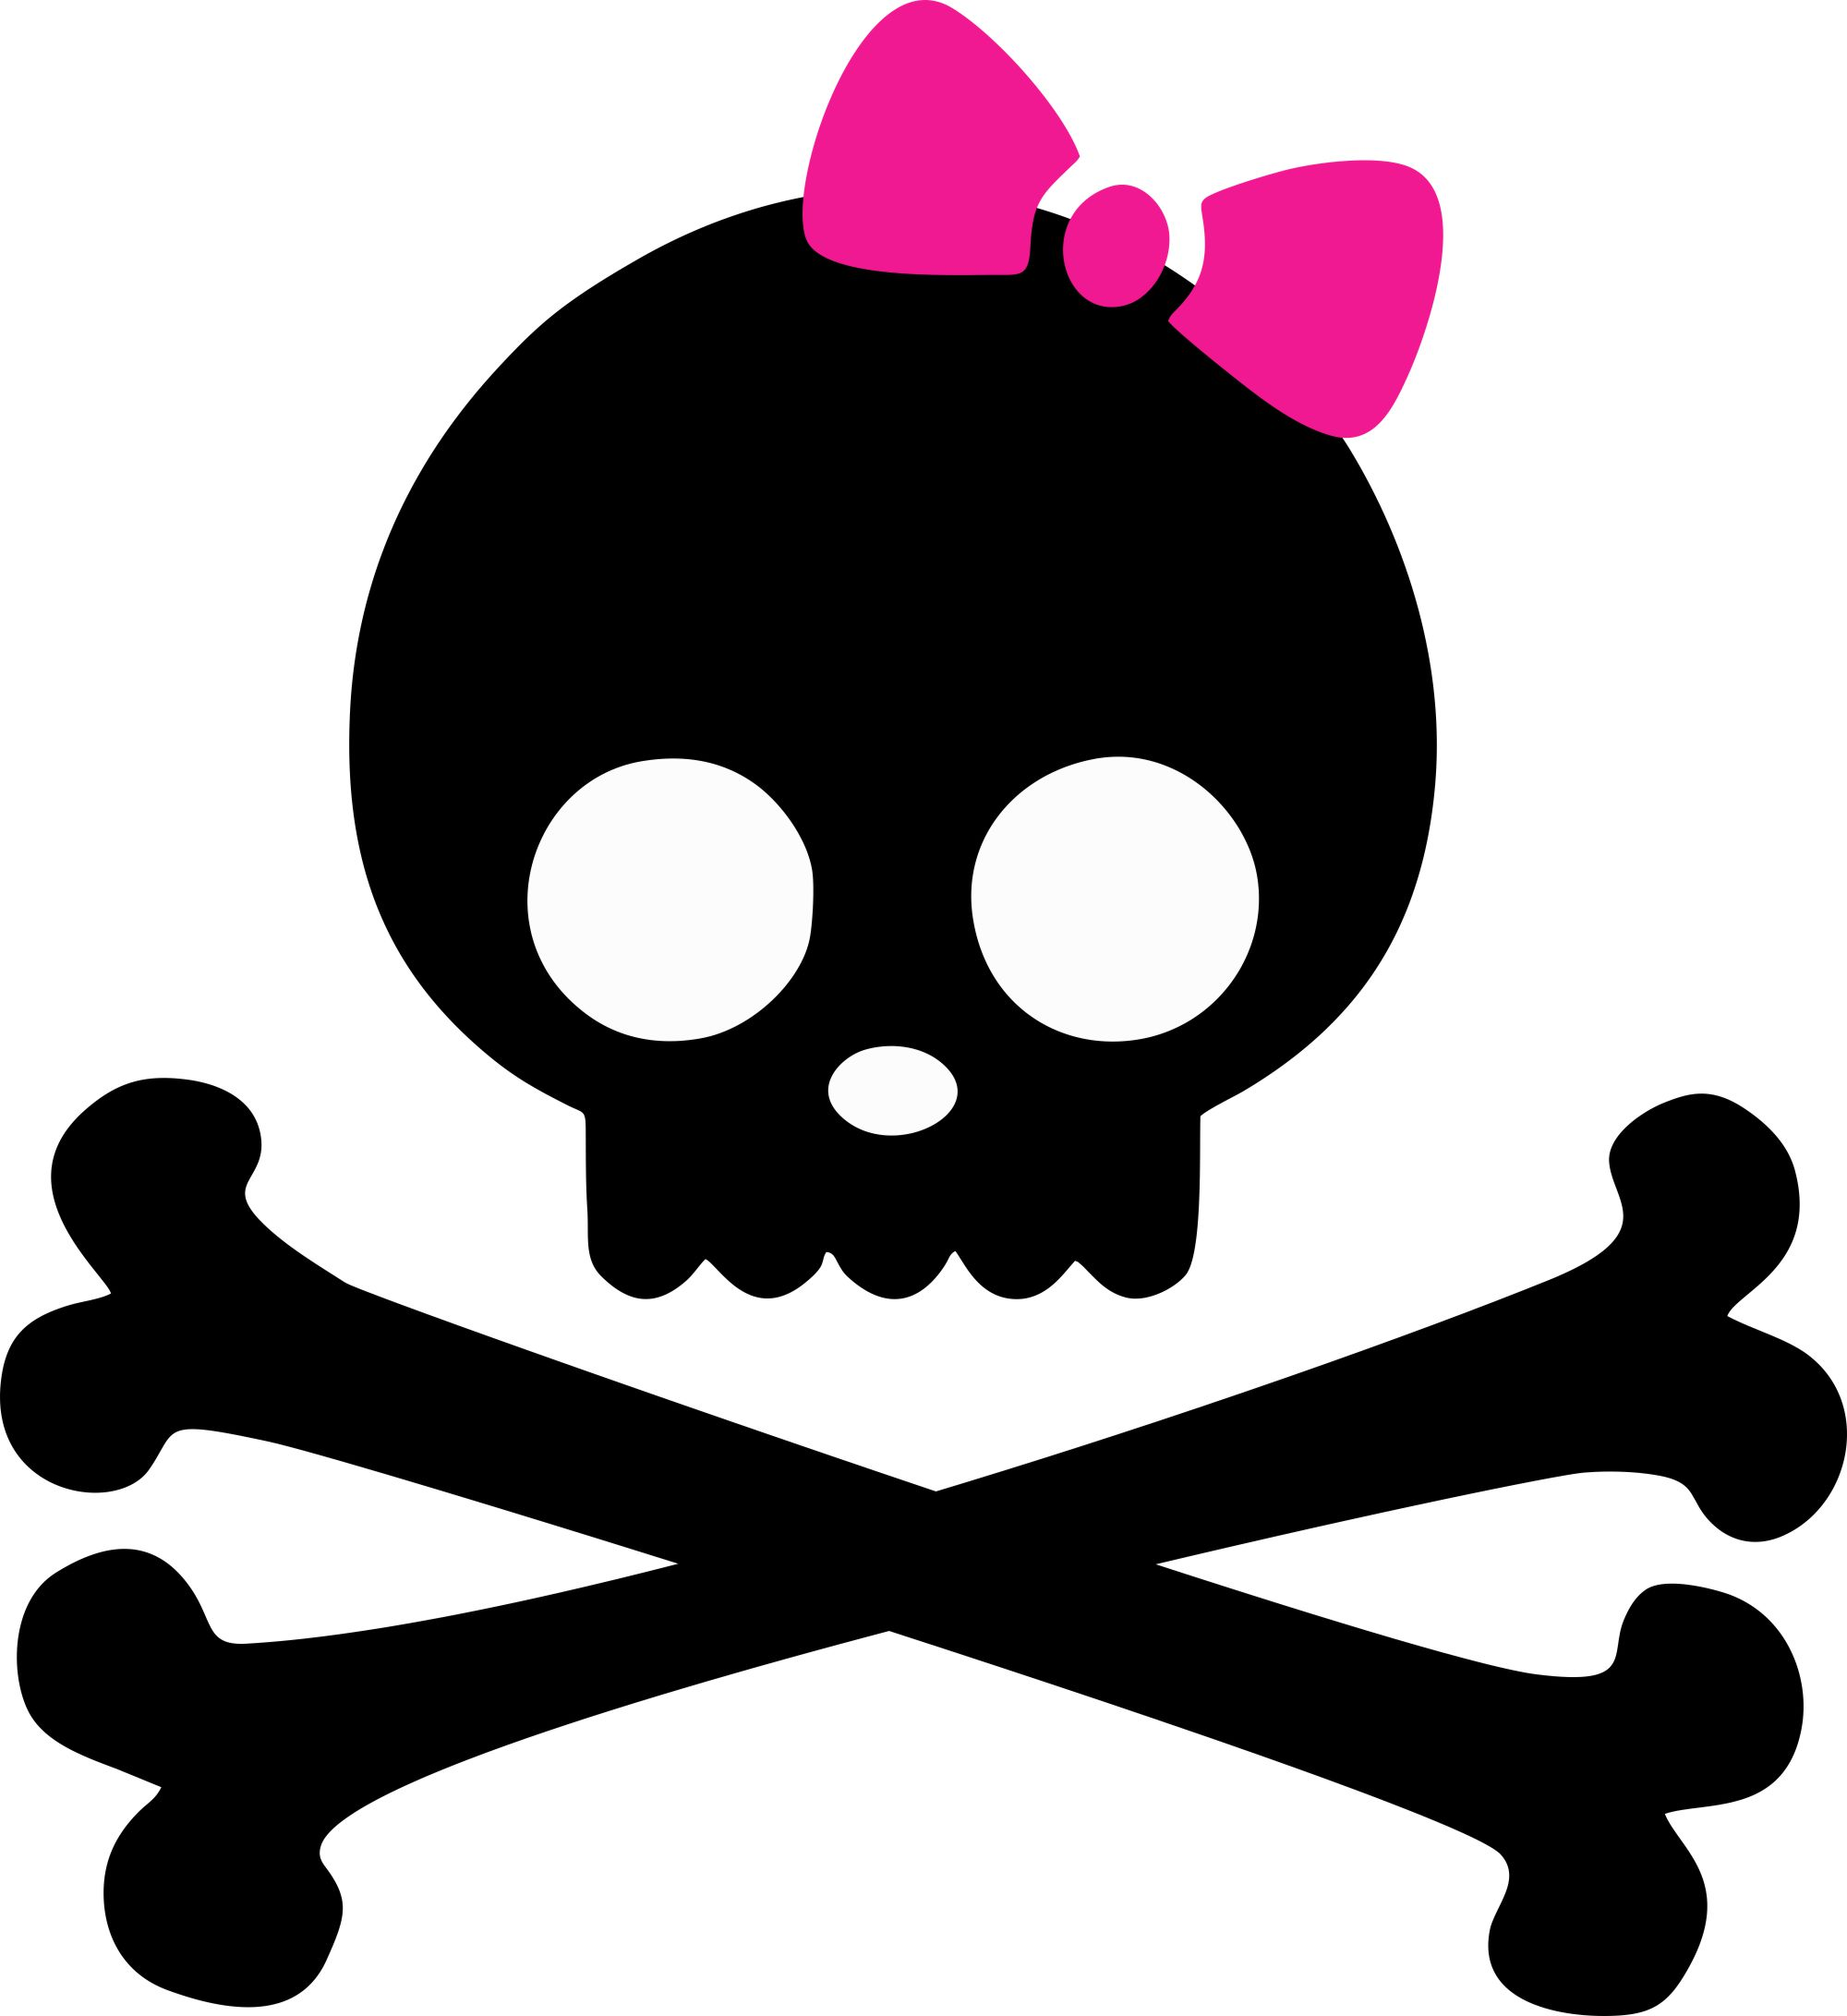 Skull And Crossbones Pink